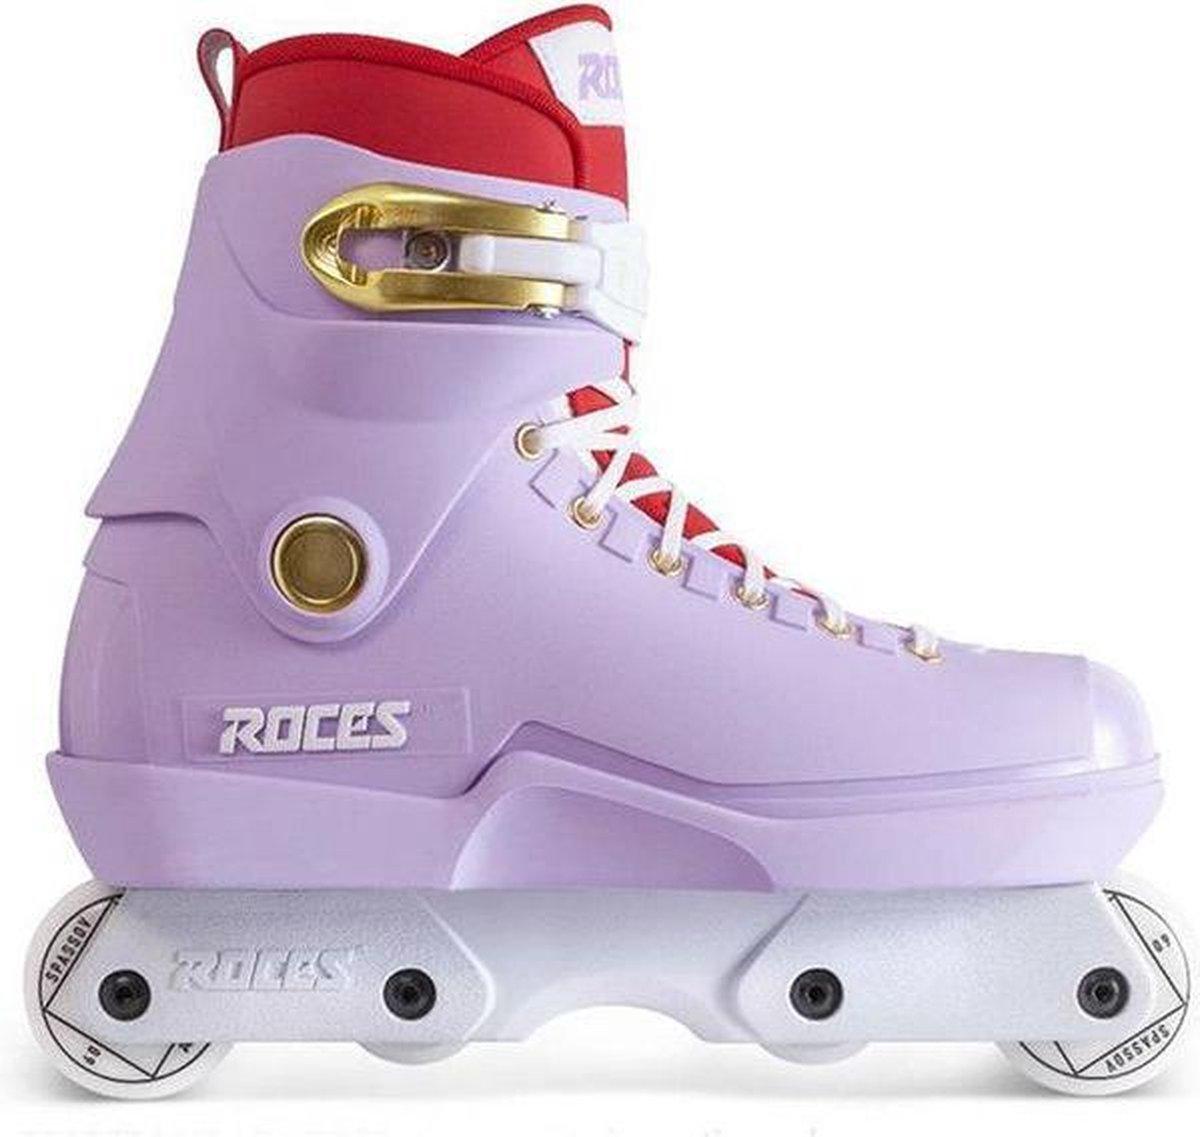 Roces M12 LO Spassov inline skates domestic punk